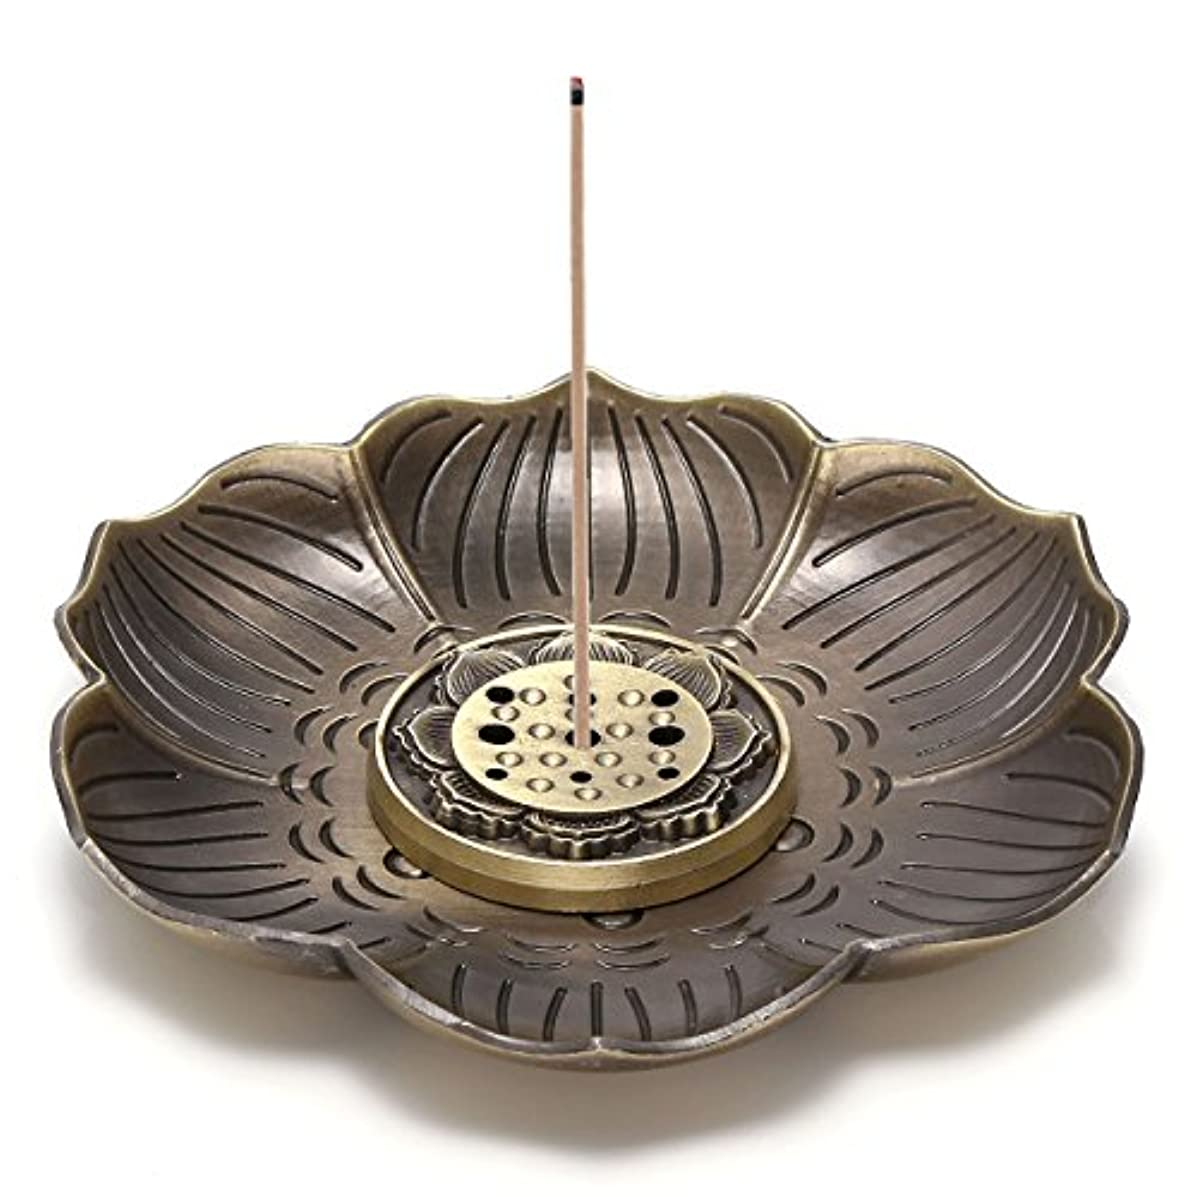 Jovivi真鍮Incense Holder – Lotus Stick Incense Burner and Cone Incense逆流ホルダーwith Ashキャッチャー AJ101010100651